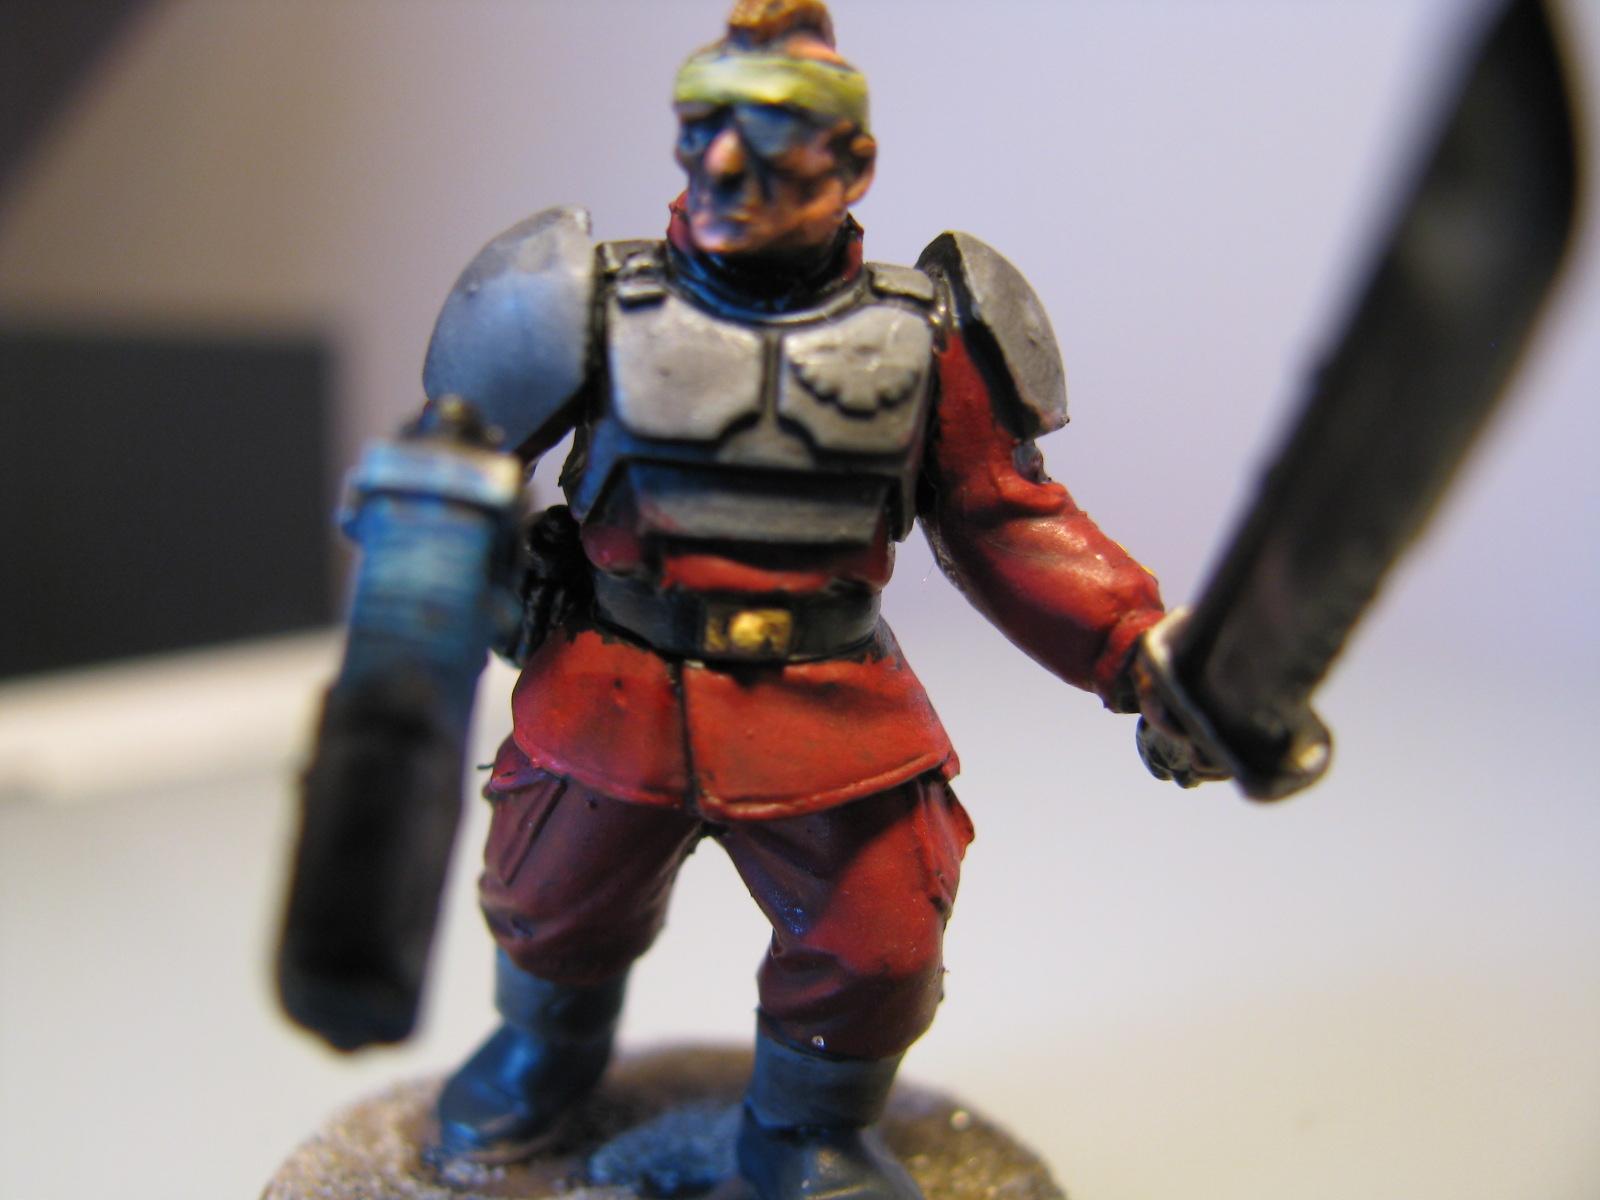 Guard, Imperial Guard, Nmm Gold, Plasma Pistol, Powersword, Sergeant, Sword